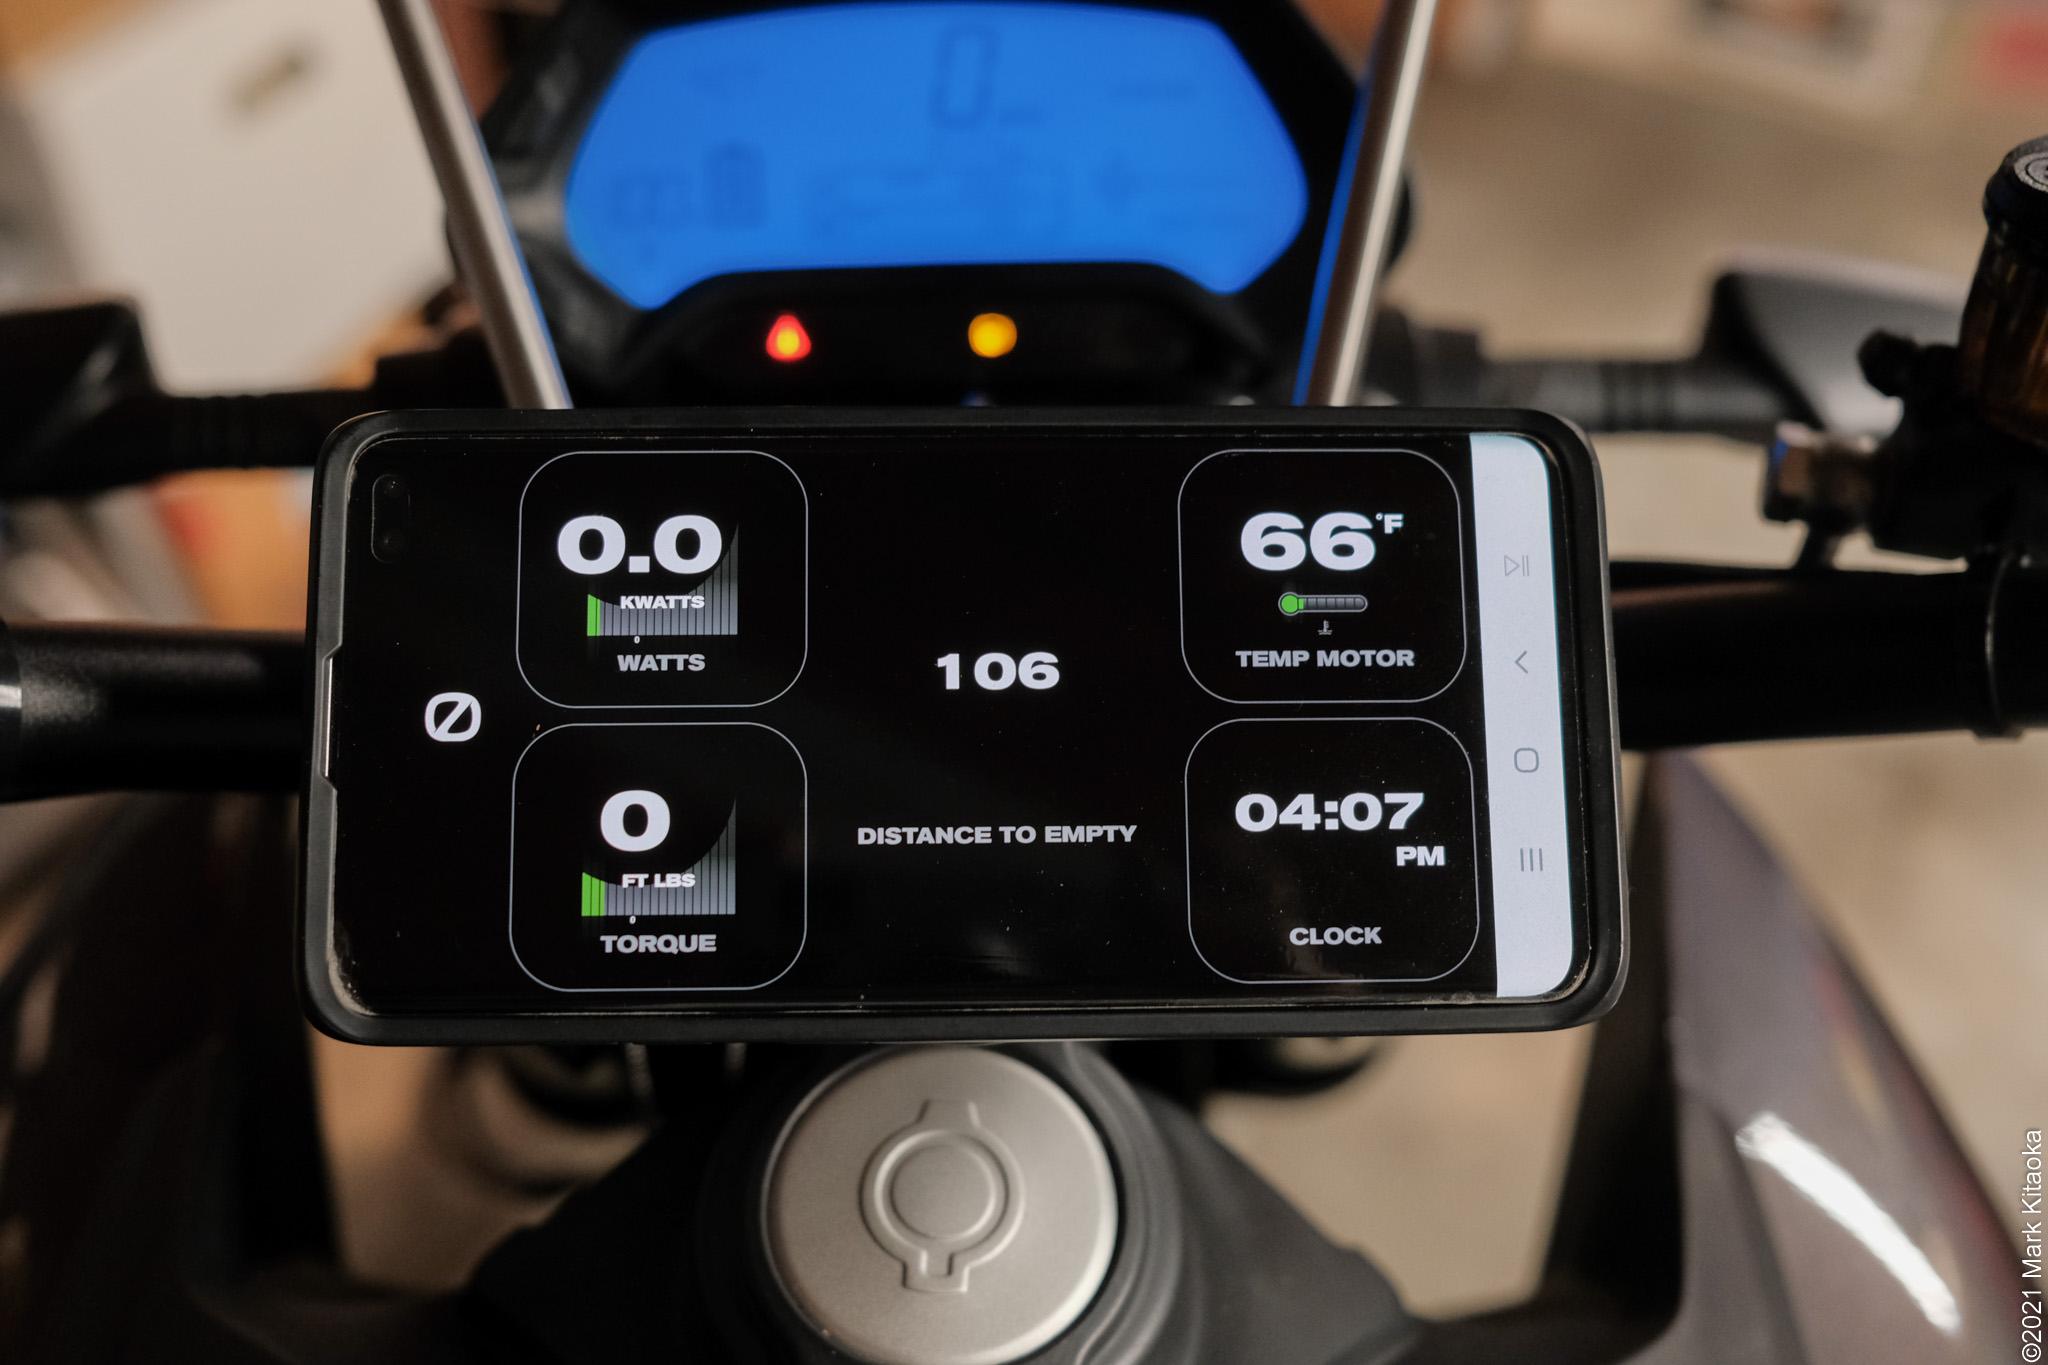 Smartphone app on handlebar mount showing various settings